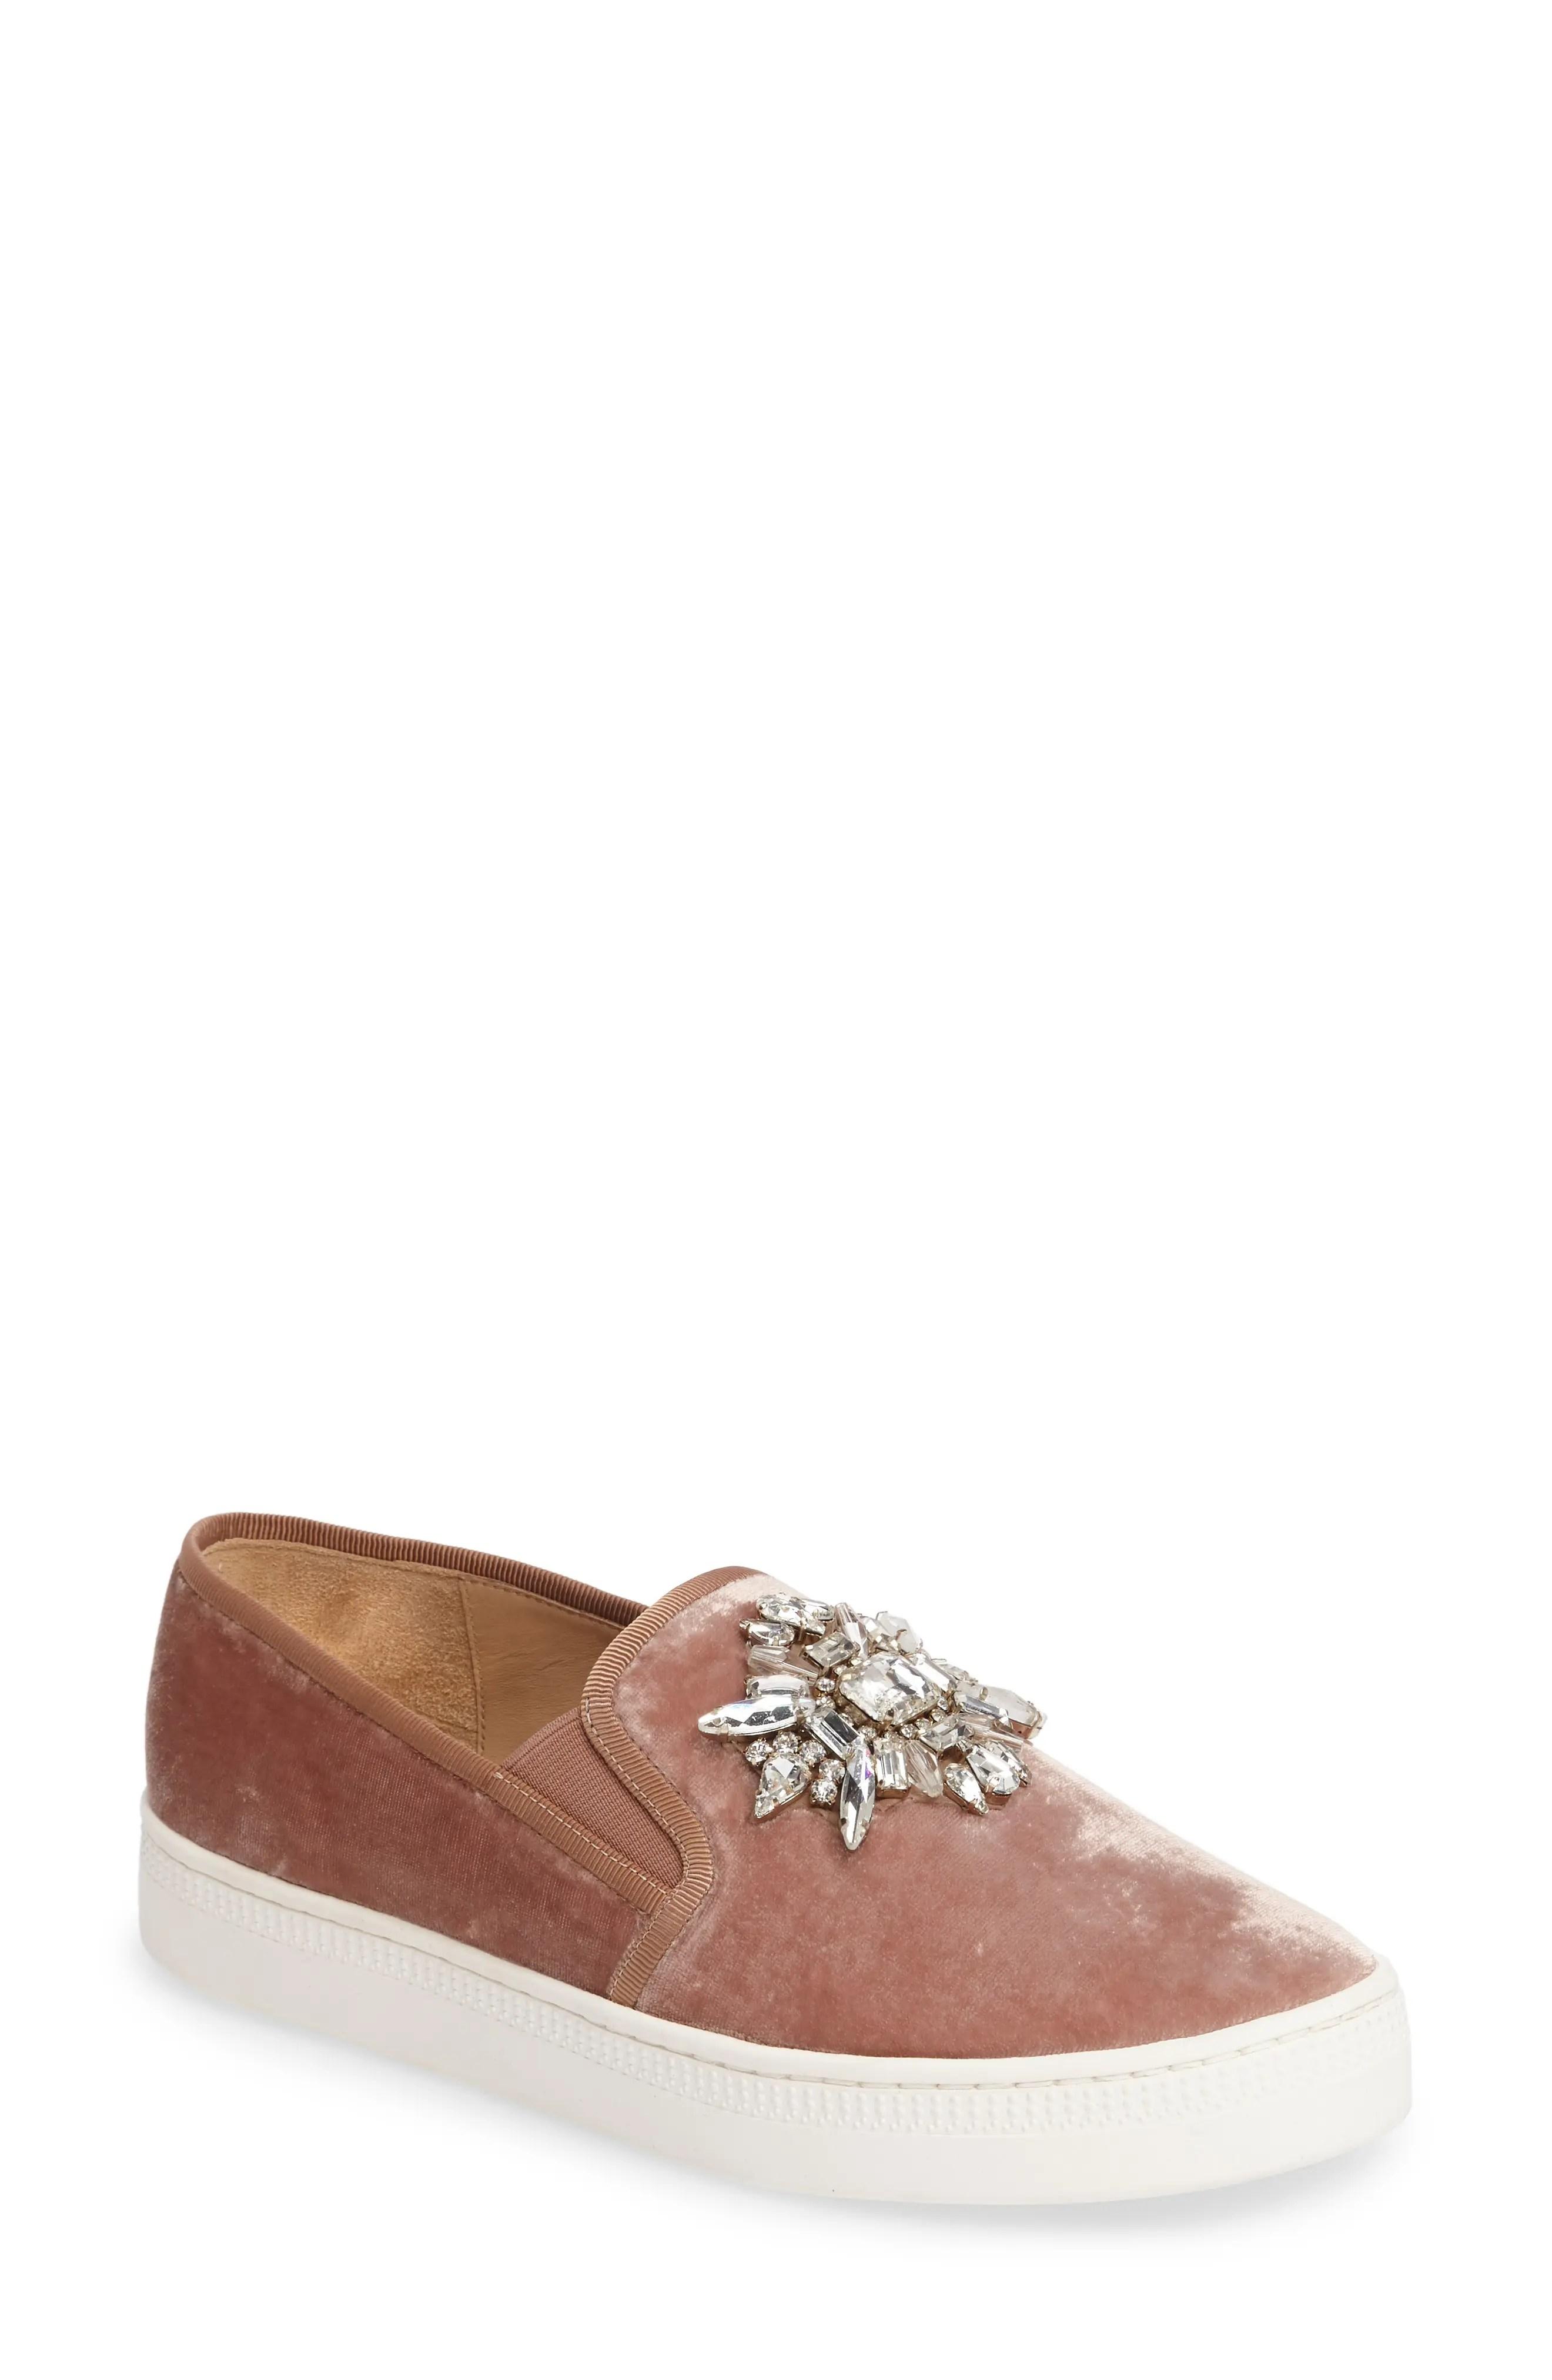 Main Image - Badgley Mischka Barre Crystal Embellished Slip-On Sneaker (Women)